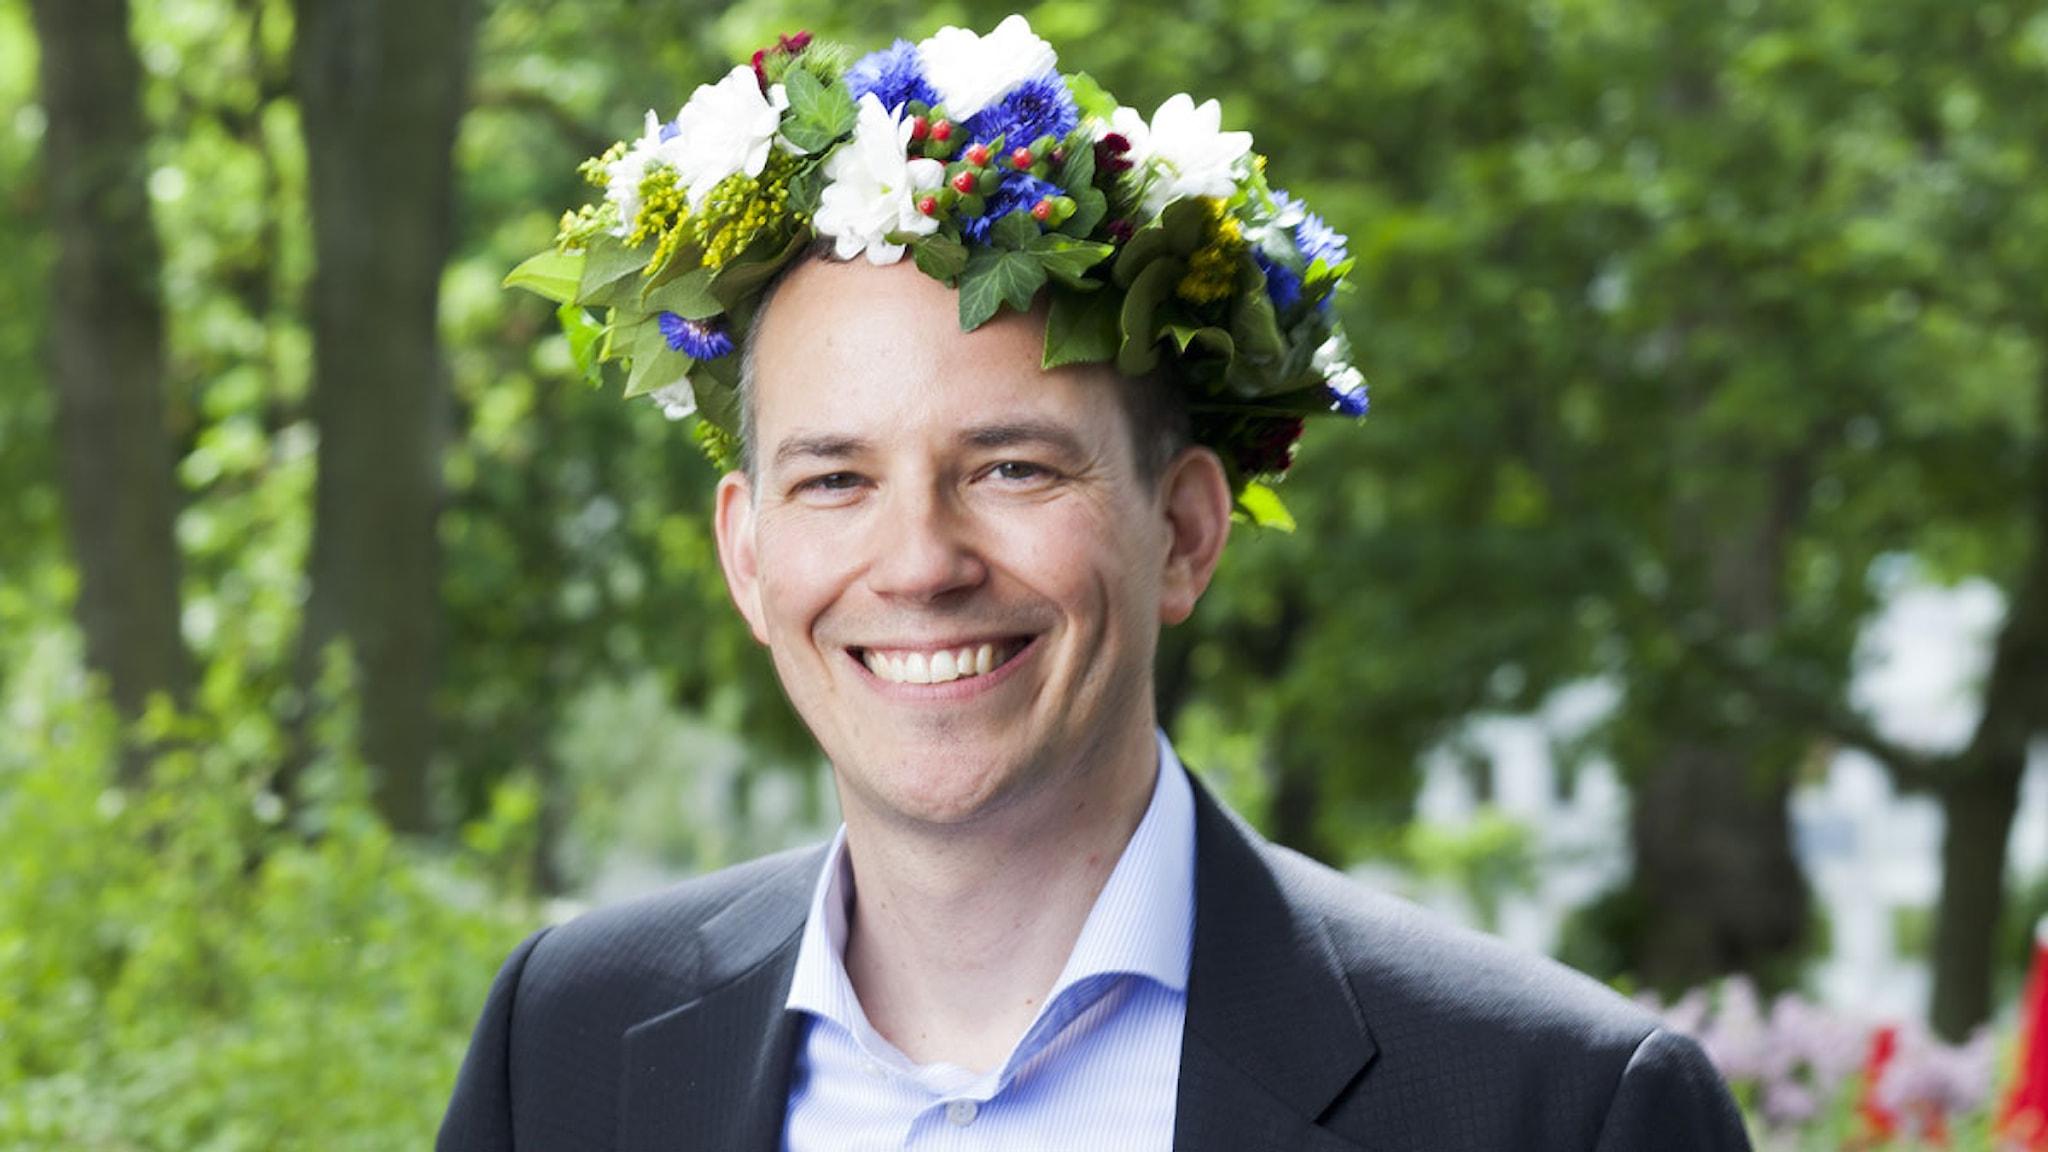 Ulf Ellervik foto: Mattias Ahlm/Sveriges Radio